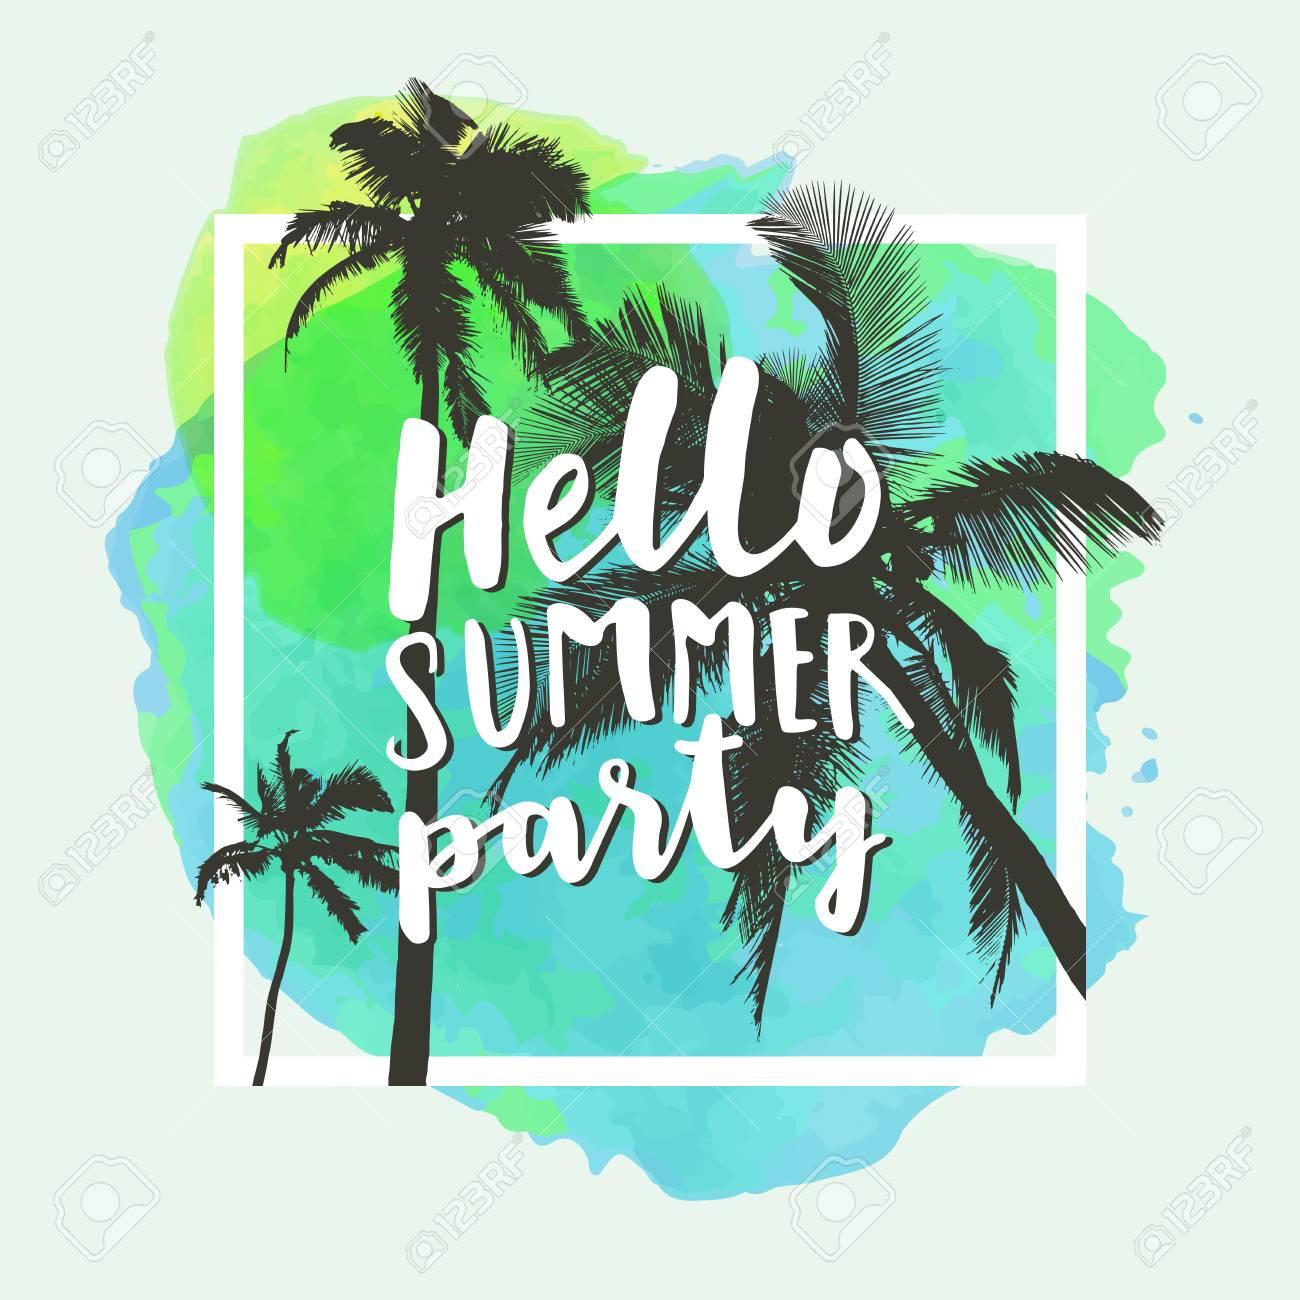 Summer T Shirt Designs   Hello Summer Party Modern Calligraphic T Shirt Design With Flat